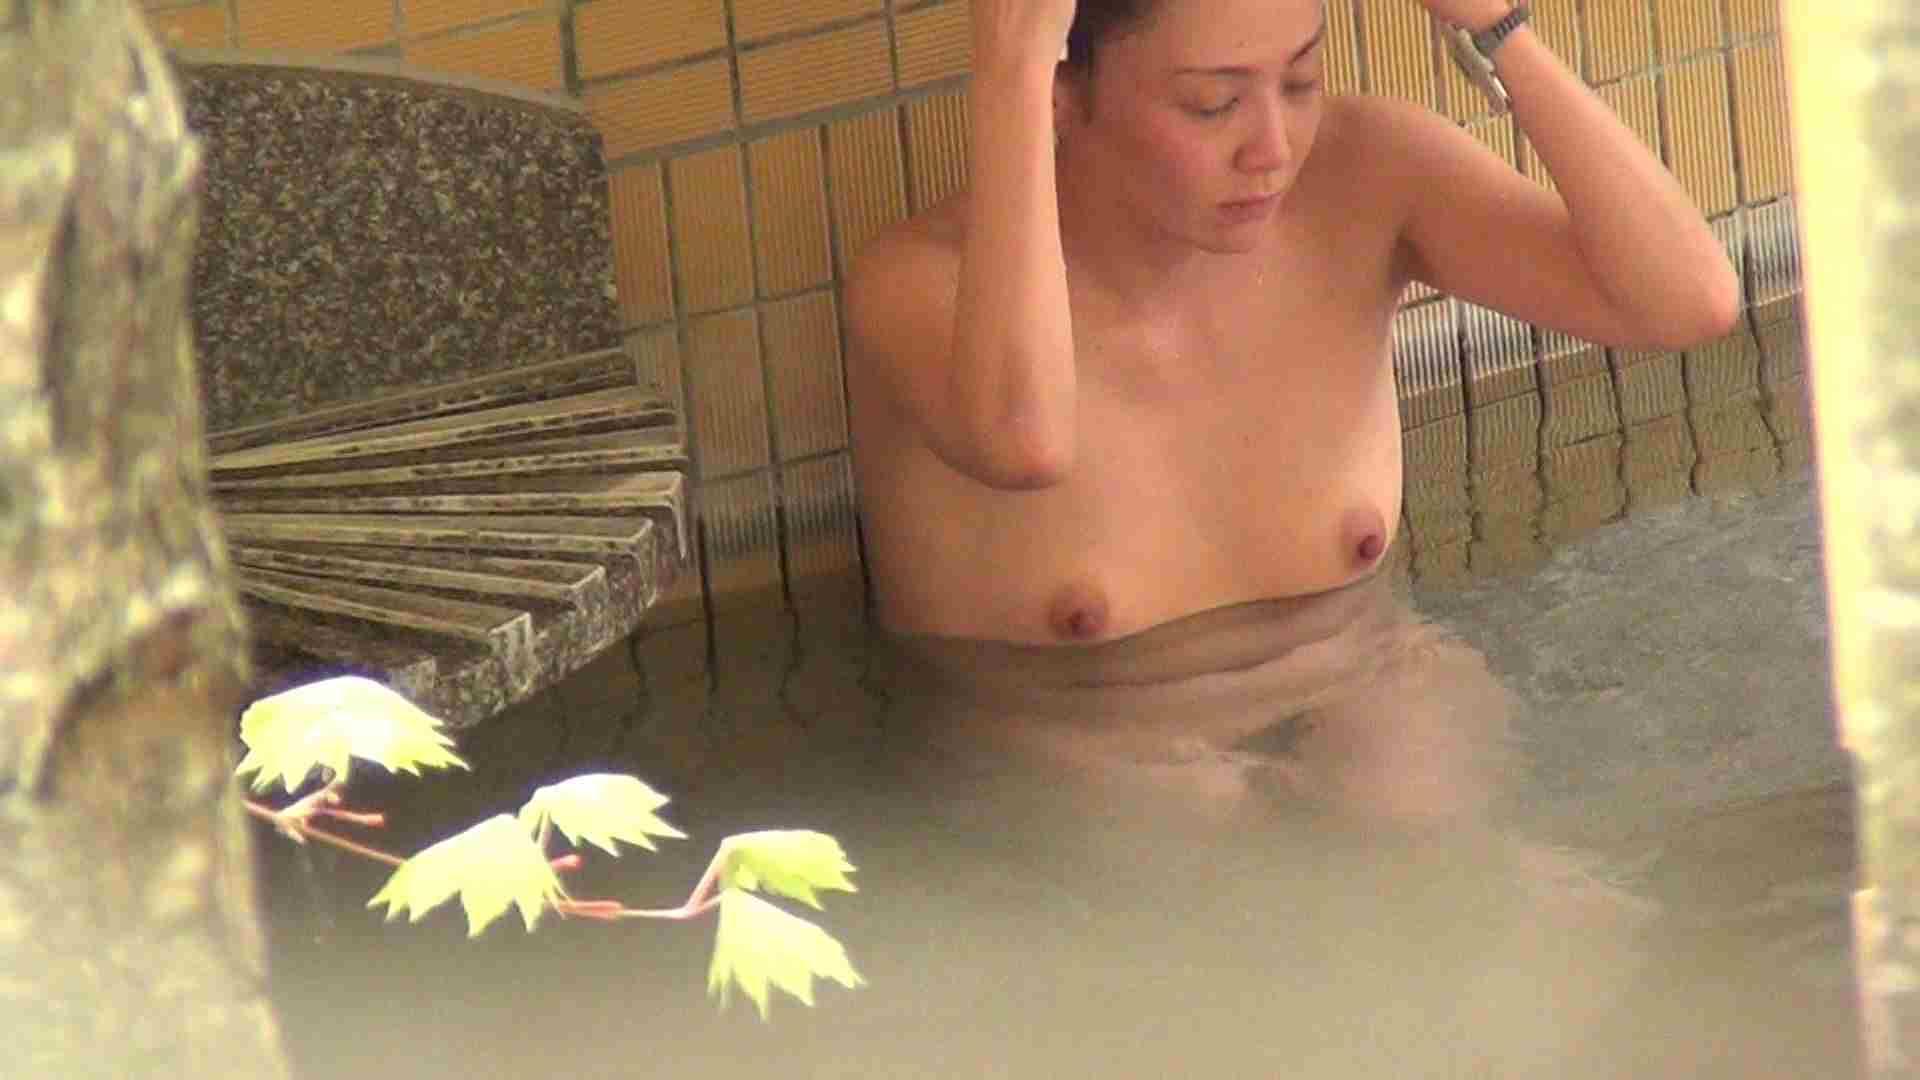 Aquaな露天風呂Vol.231 エッチな盗撮  113pic 4